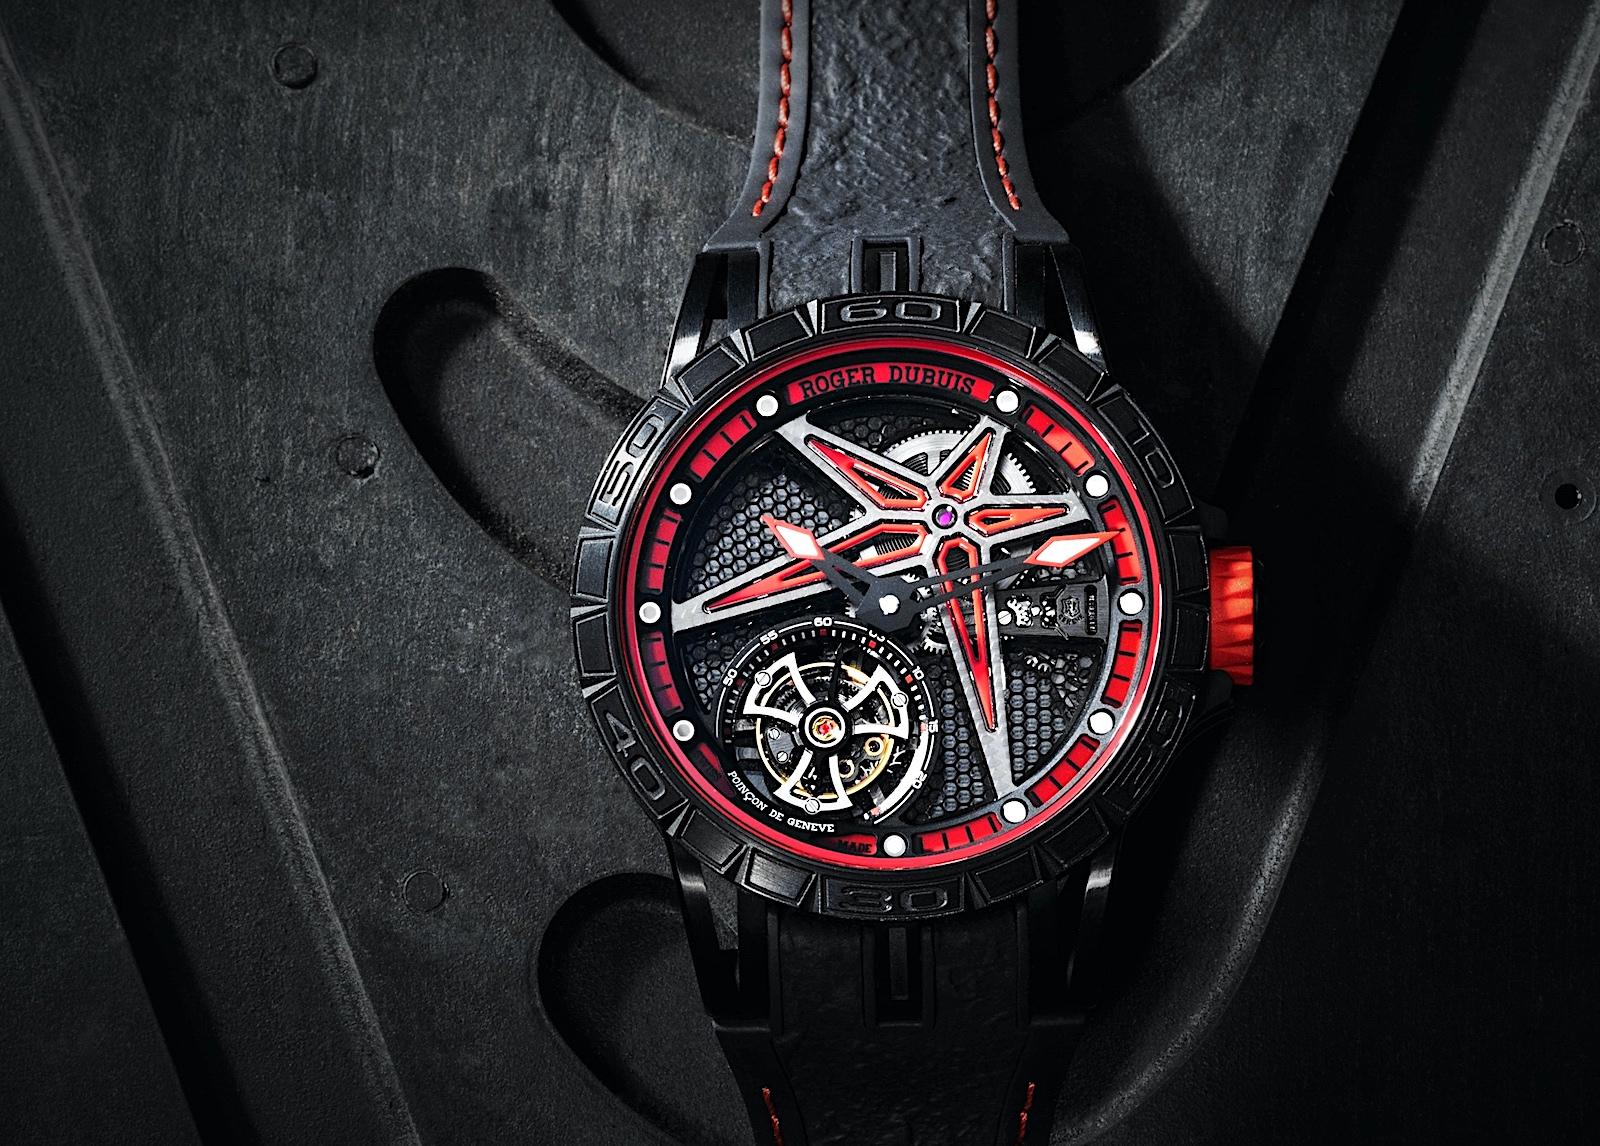 Roger Dubuis Excalibur Spider Flying Tourbillon 39 - Pirelli 03